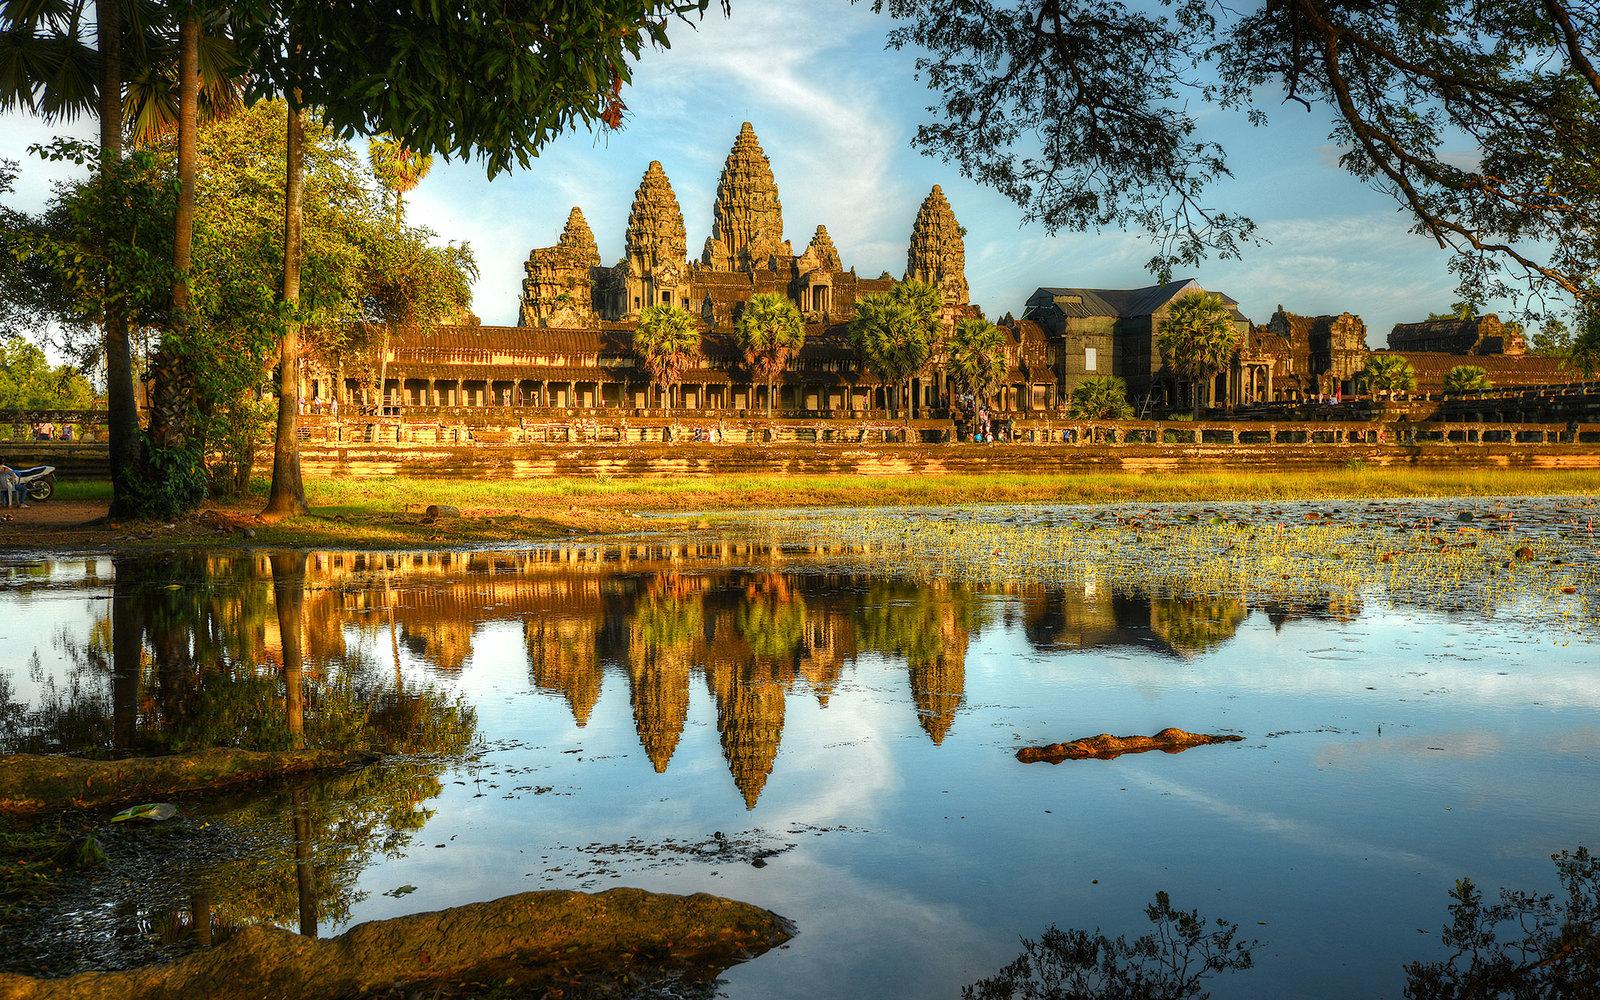 Cambodia & Vietnam Explorer, Siem Reap, Angkor Wat